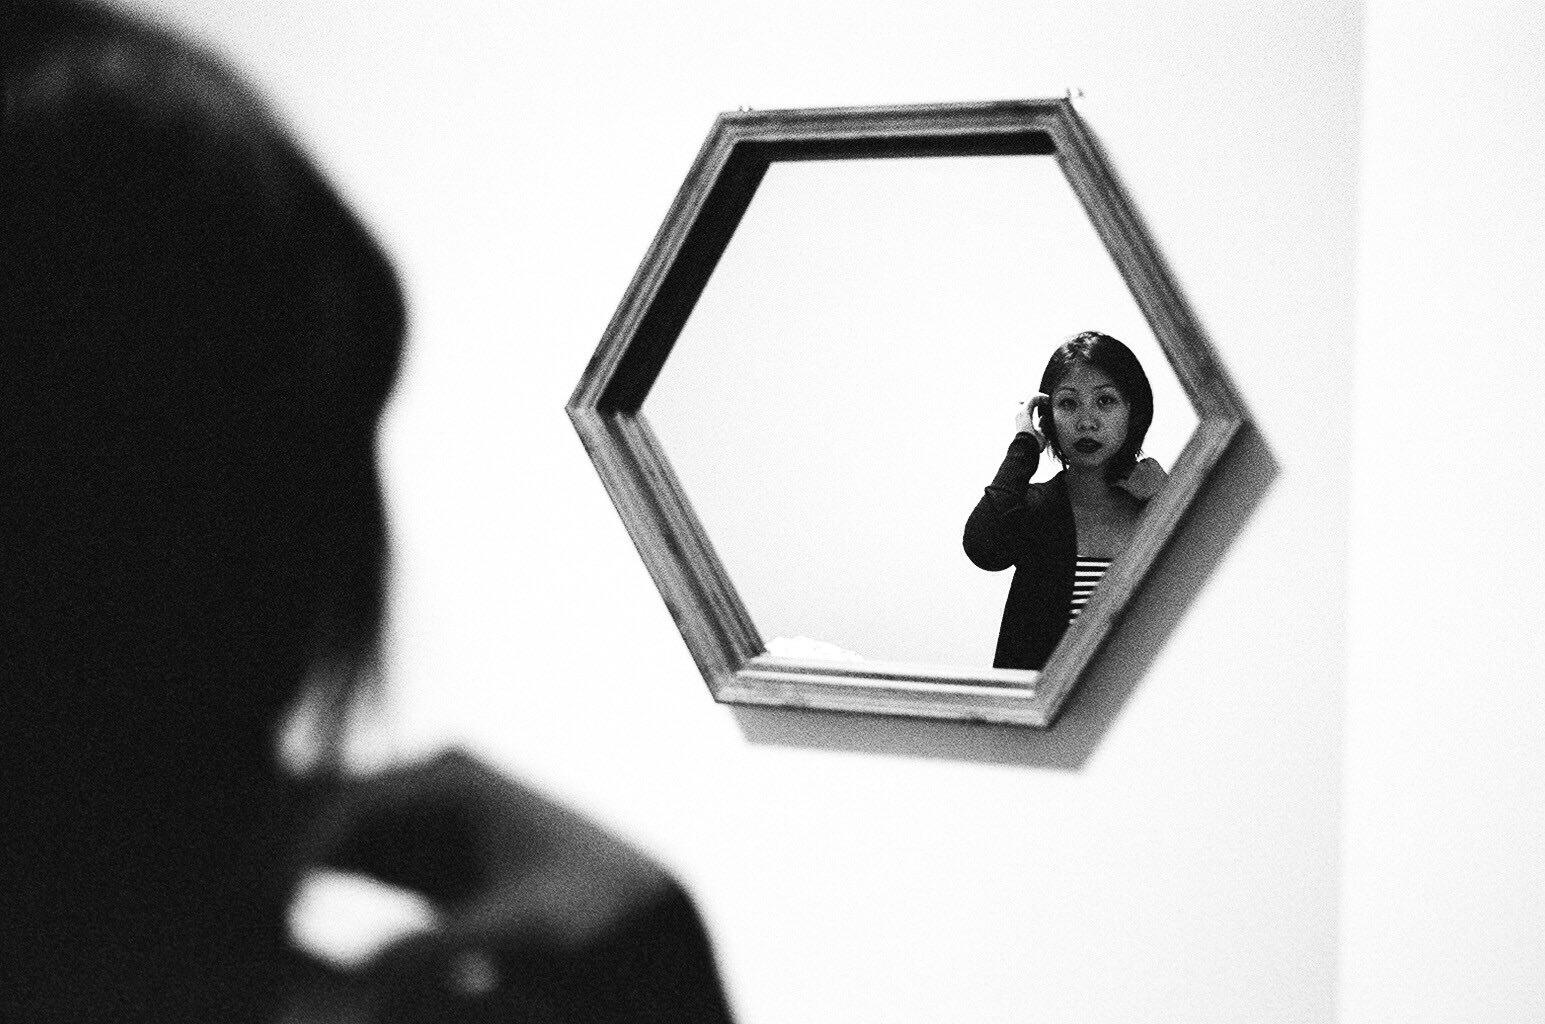 eric kim photography - Cindy Project - berkeley